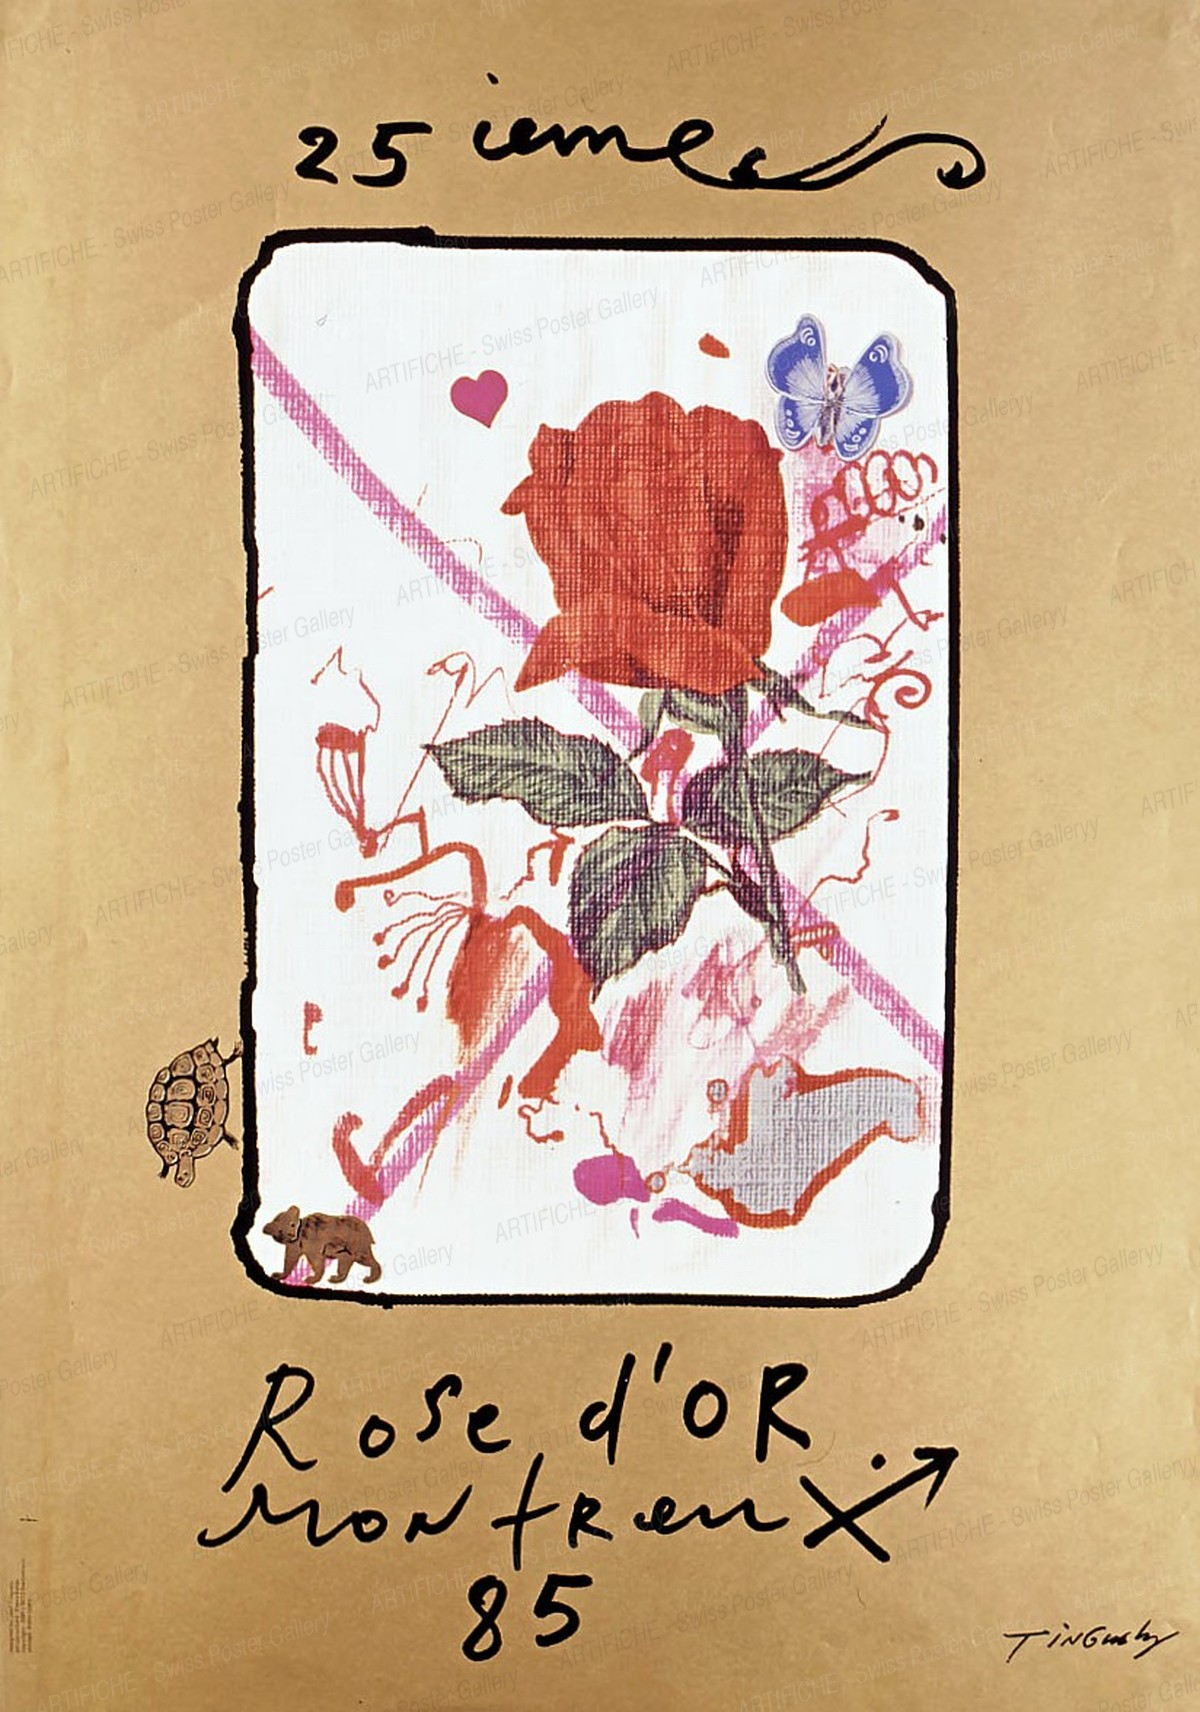 Rose d'or Montreux 1985 / 25. Festival, Jean Tinguely